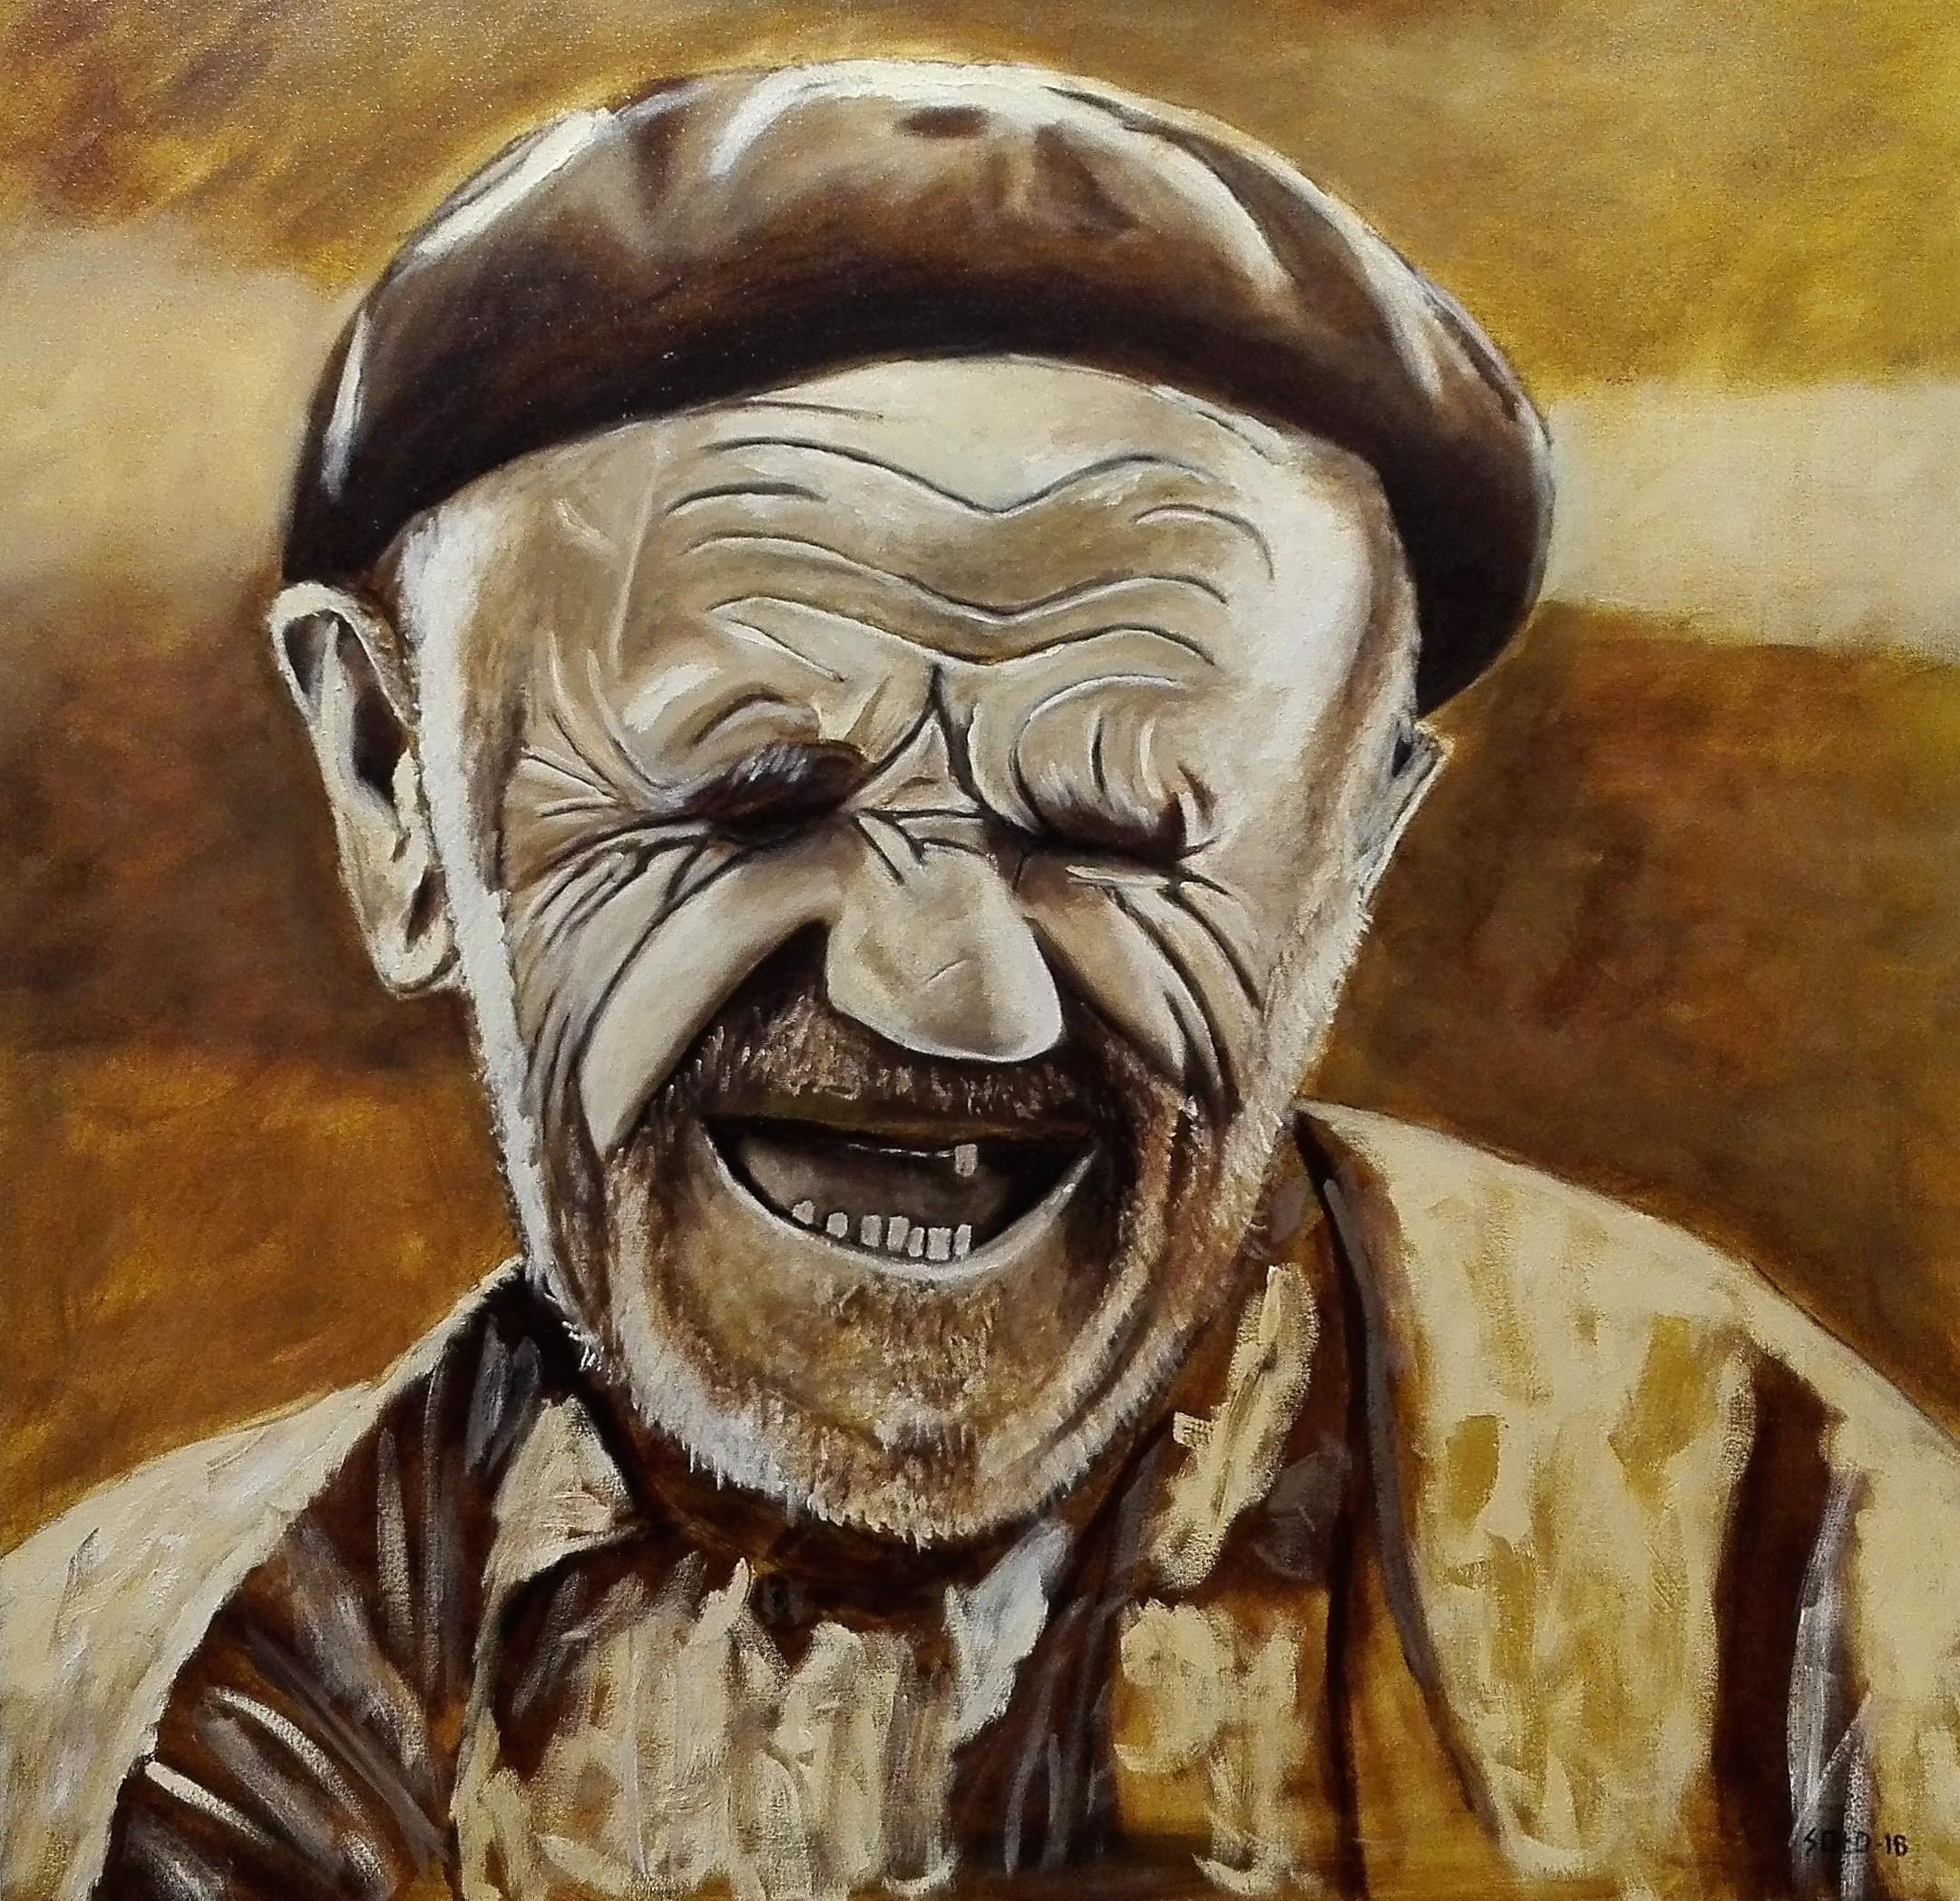 Retrato Viejito Feliz